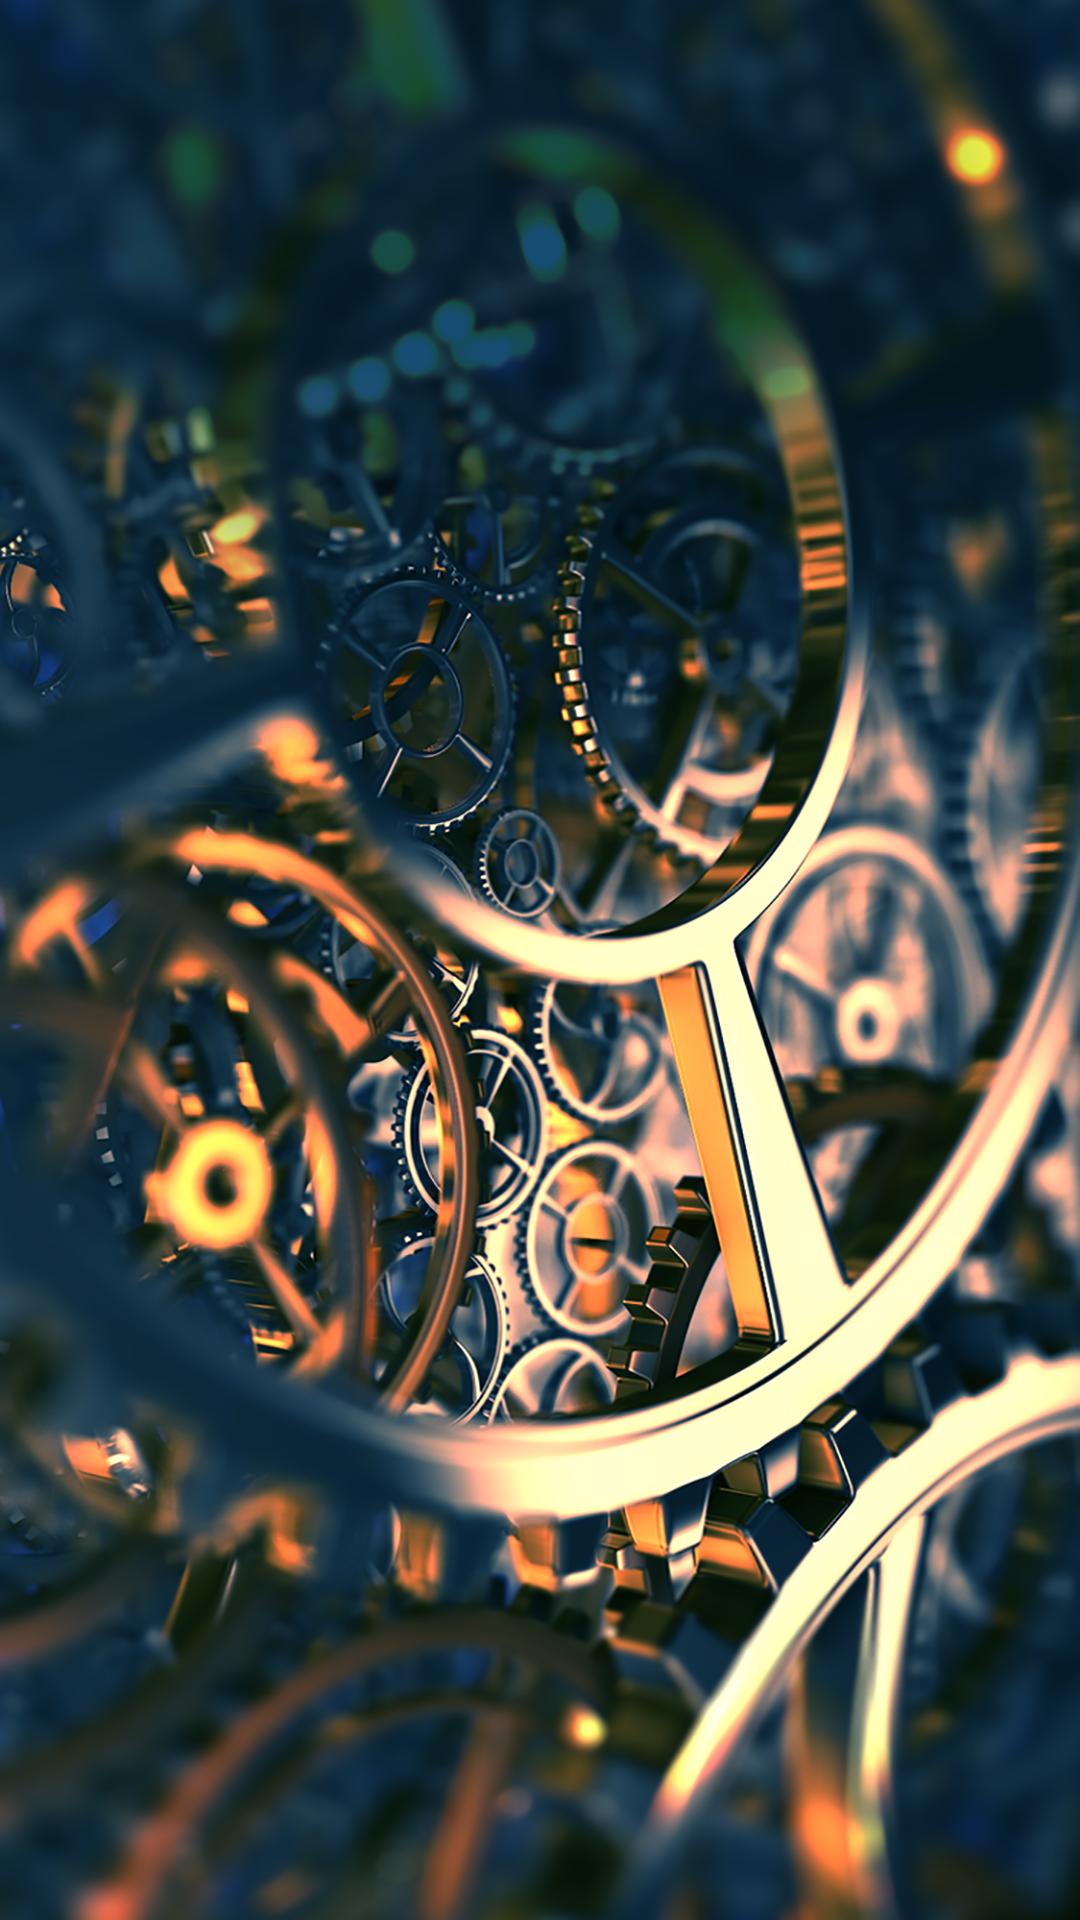 Tap And Get The Free App Art Creative Macro Time Clock Gold Mechanics Hd Iphone 6 Plus Wallpaper Steampunk Wallpaper Clock Wallpaper Iphone 6 Plus Wallpaper